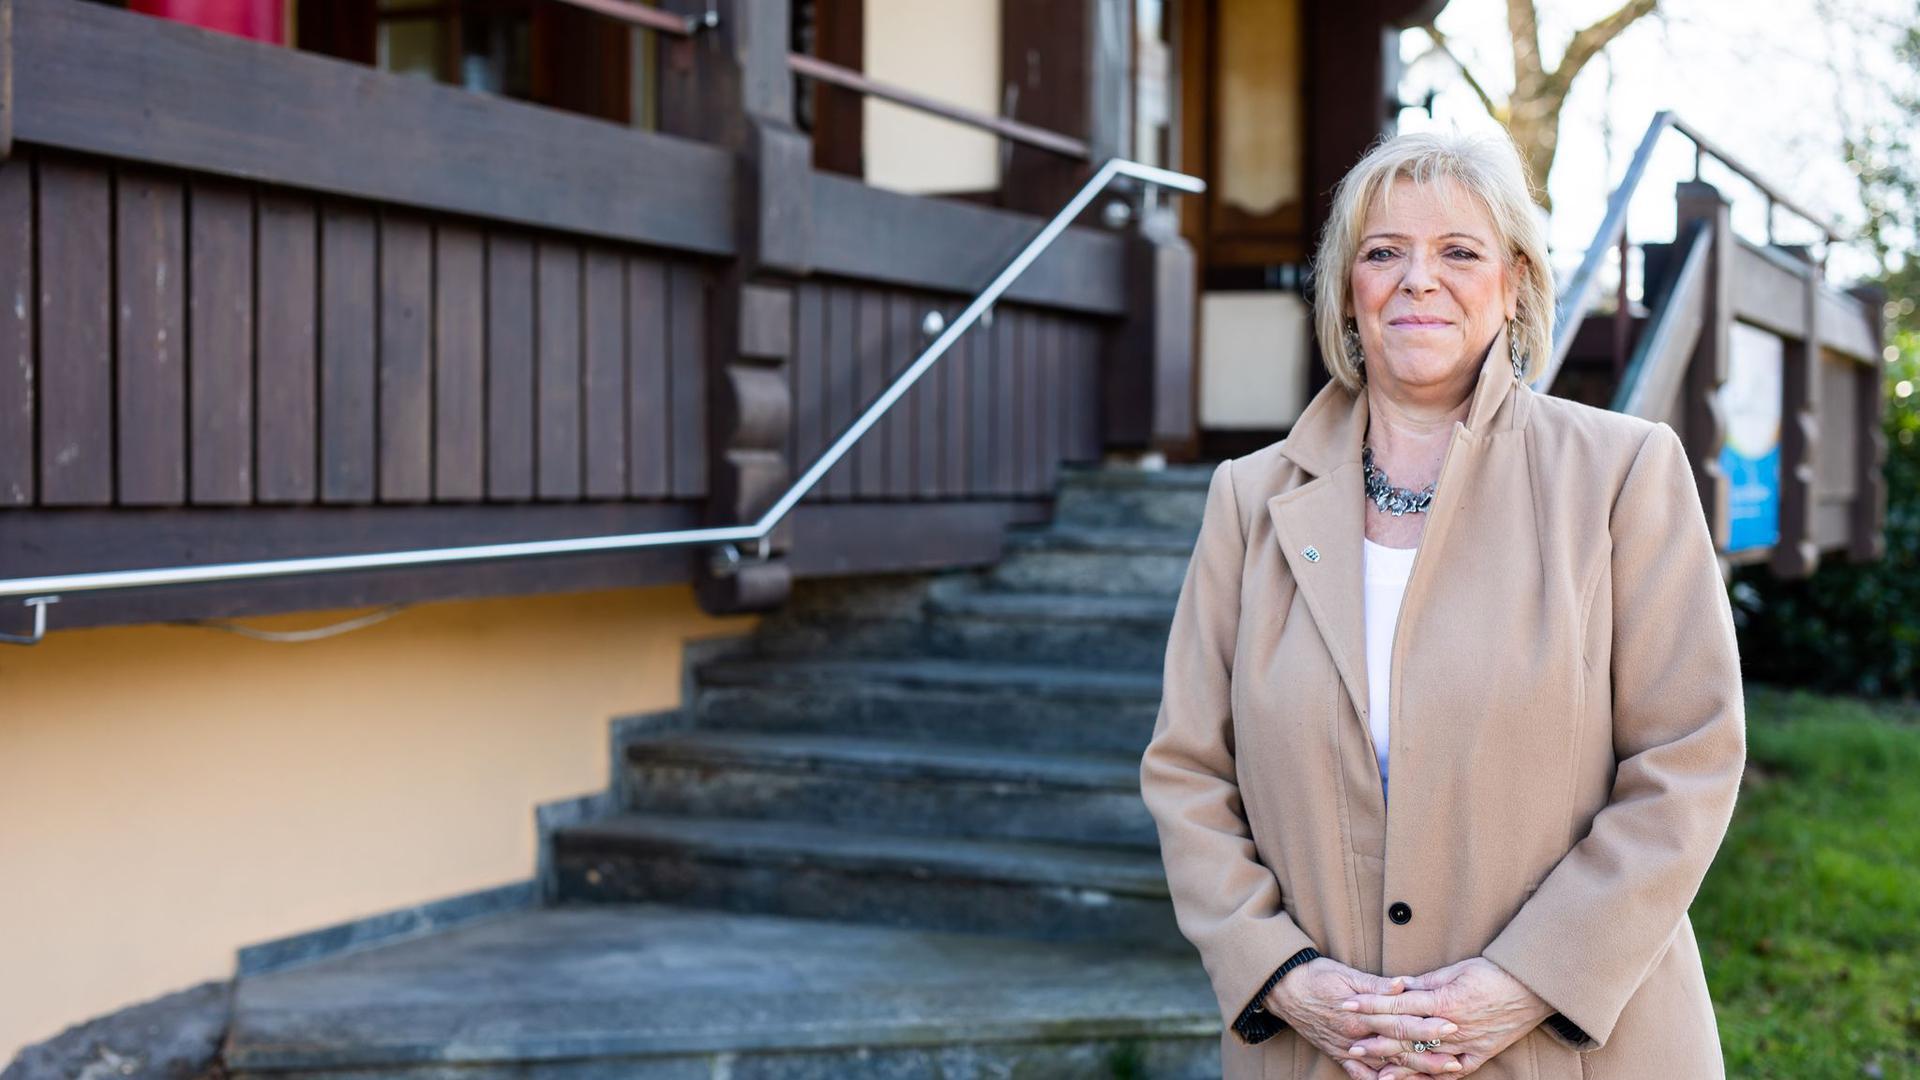 Sabine Wölfle (SPD.